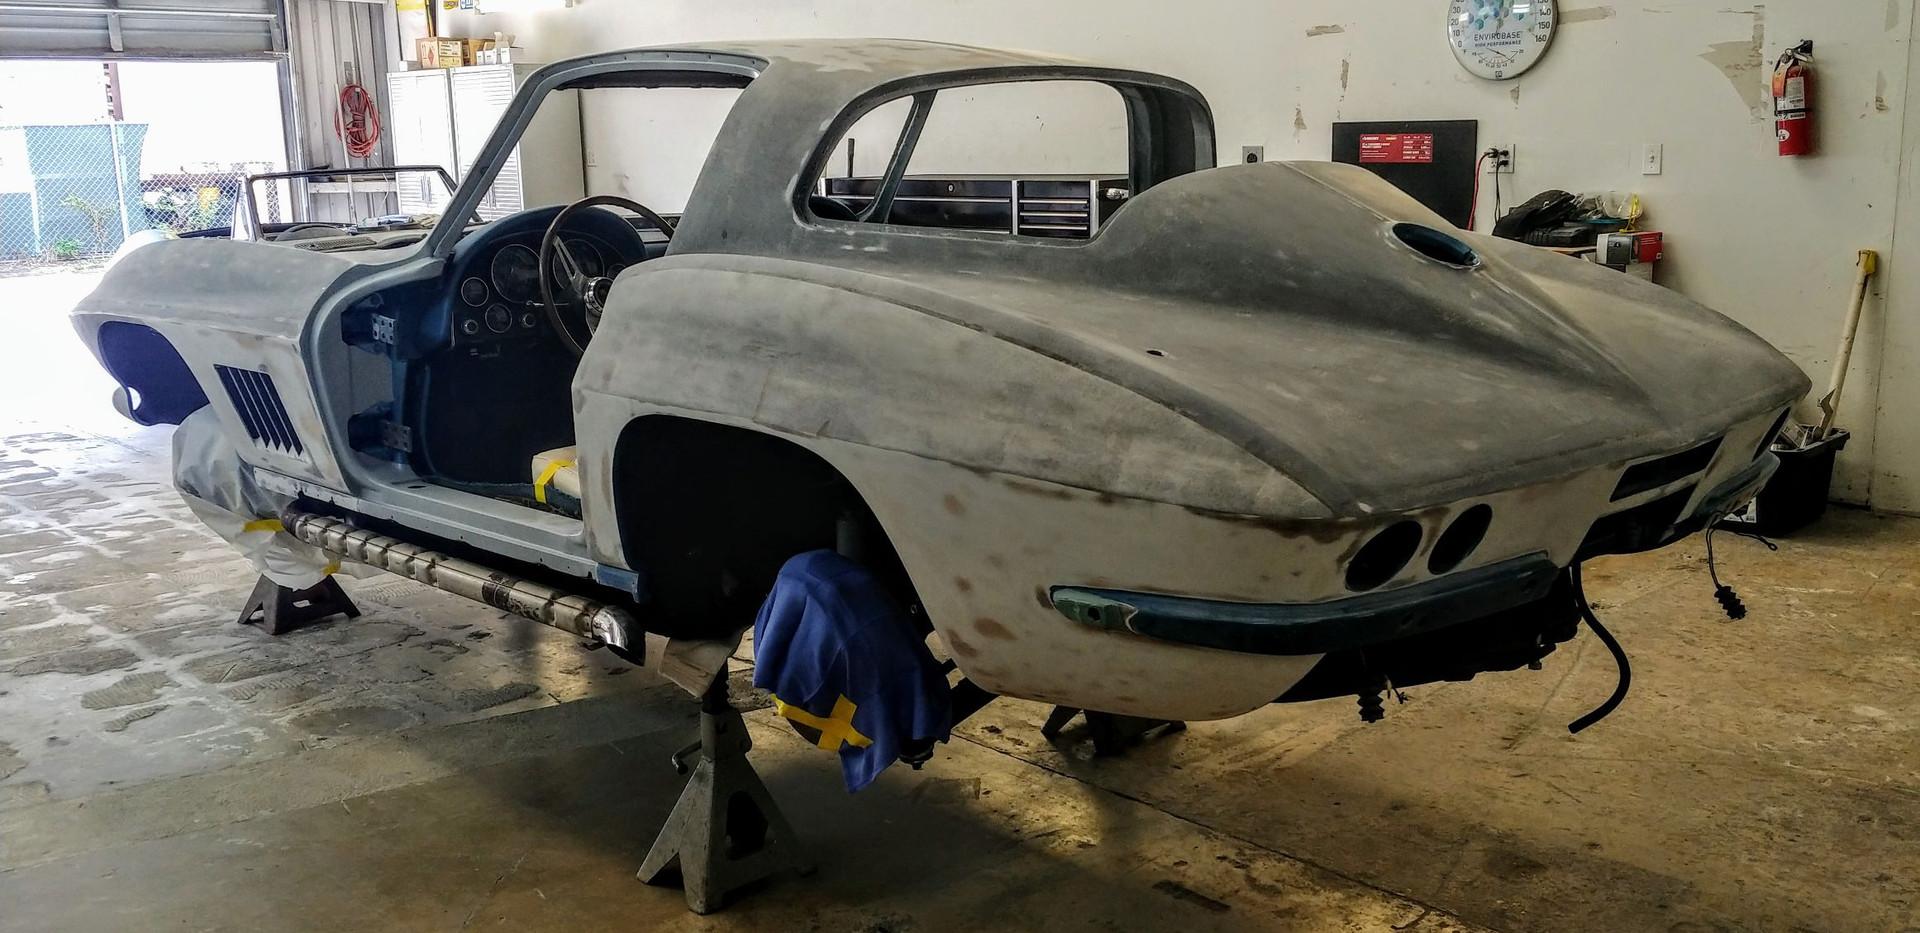 Stipped Down 1967 Corvette